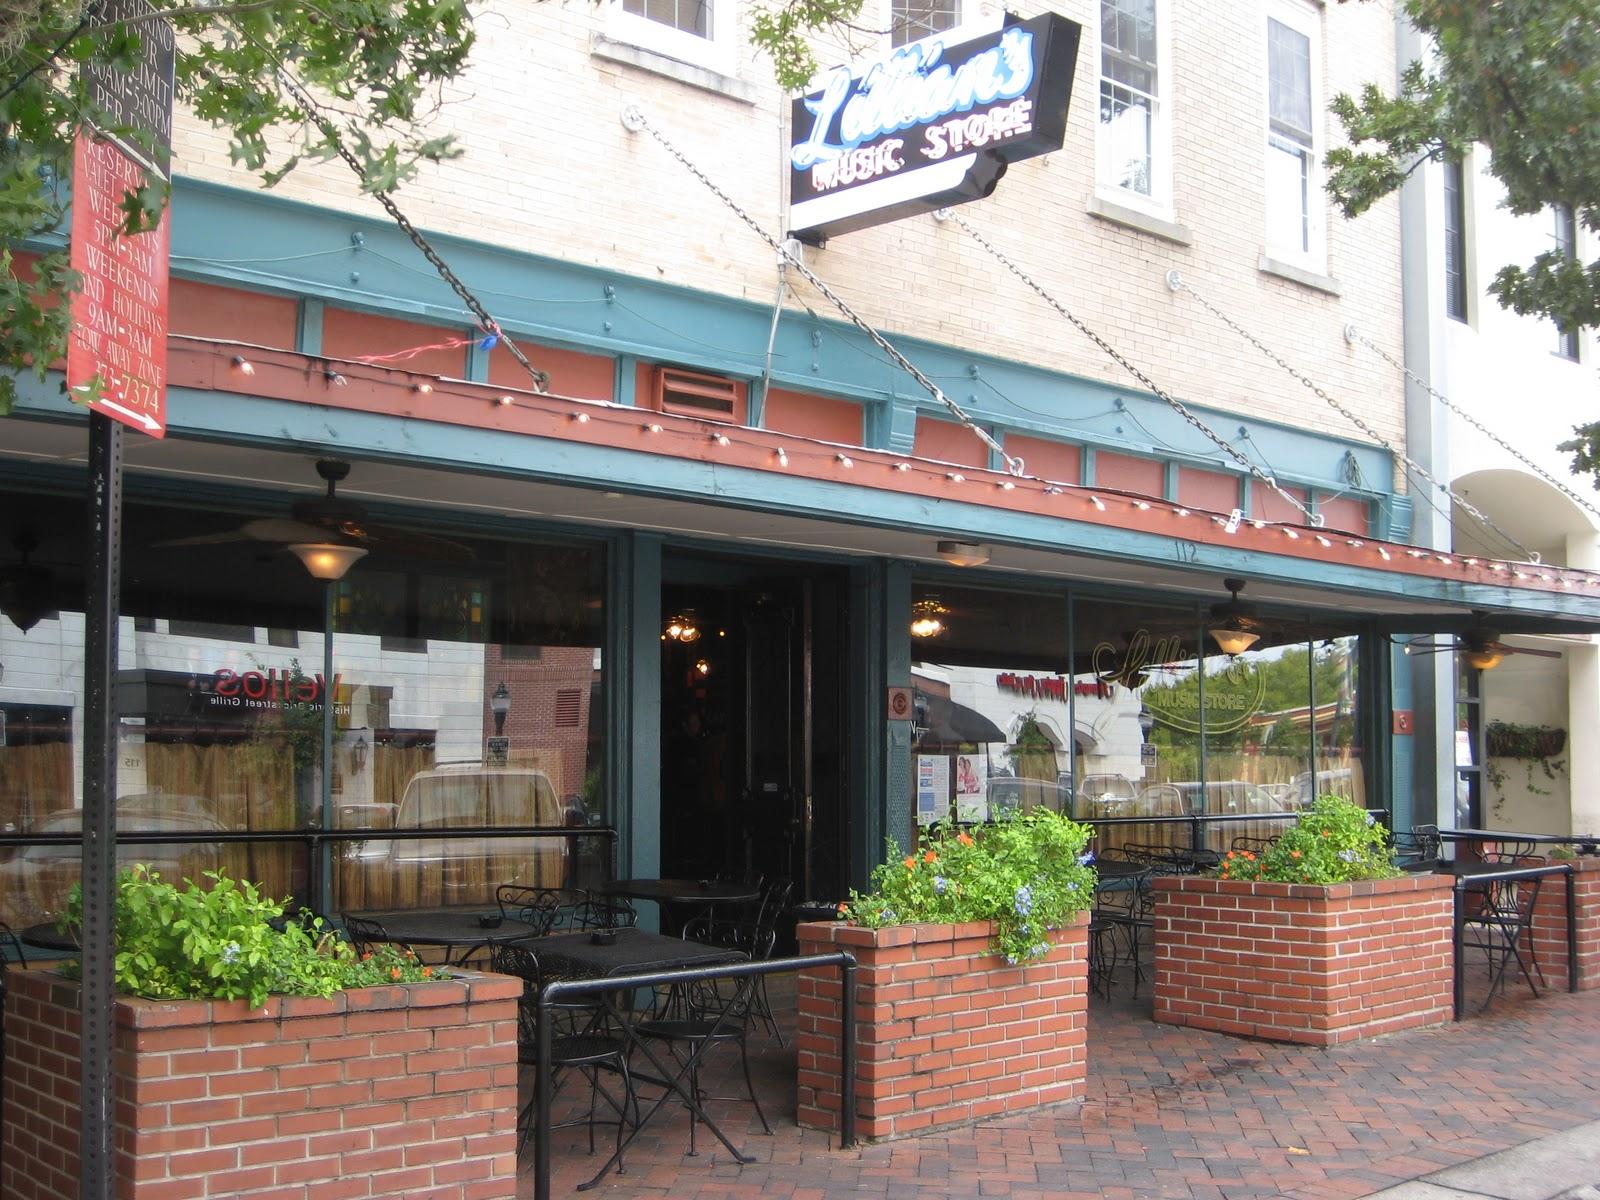 Music Stores Gainesville : save pleasure island blog club reports status night club crush lounge main street bar ~ Hamham.info Haus und Dekorationen